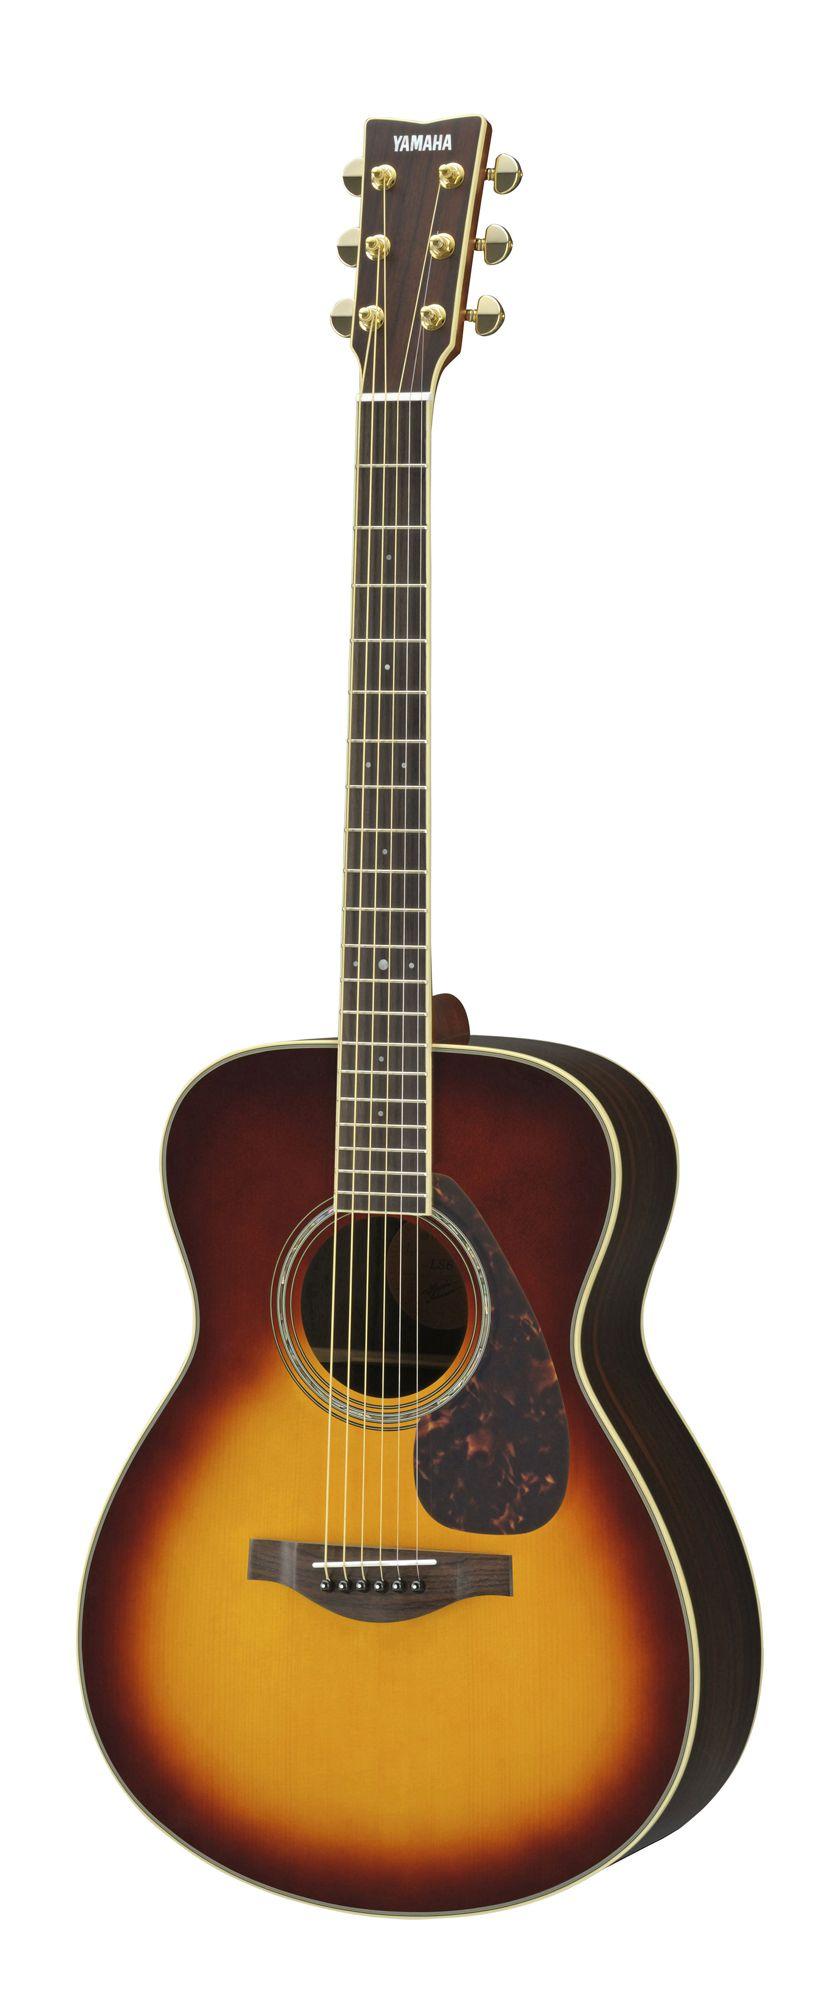 Violão Yamaha LS6 ARE - Brown Sunburst